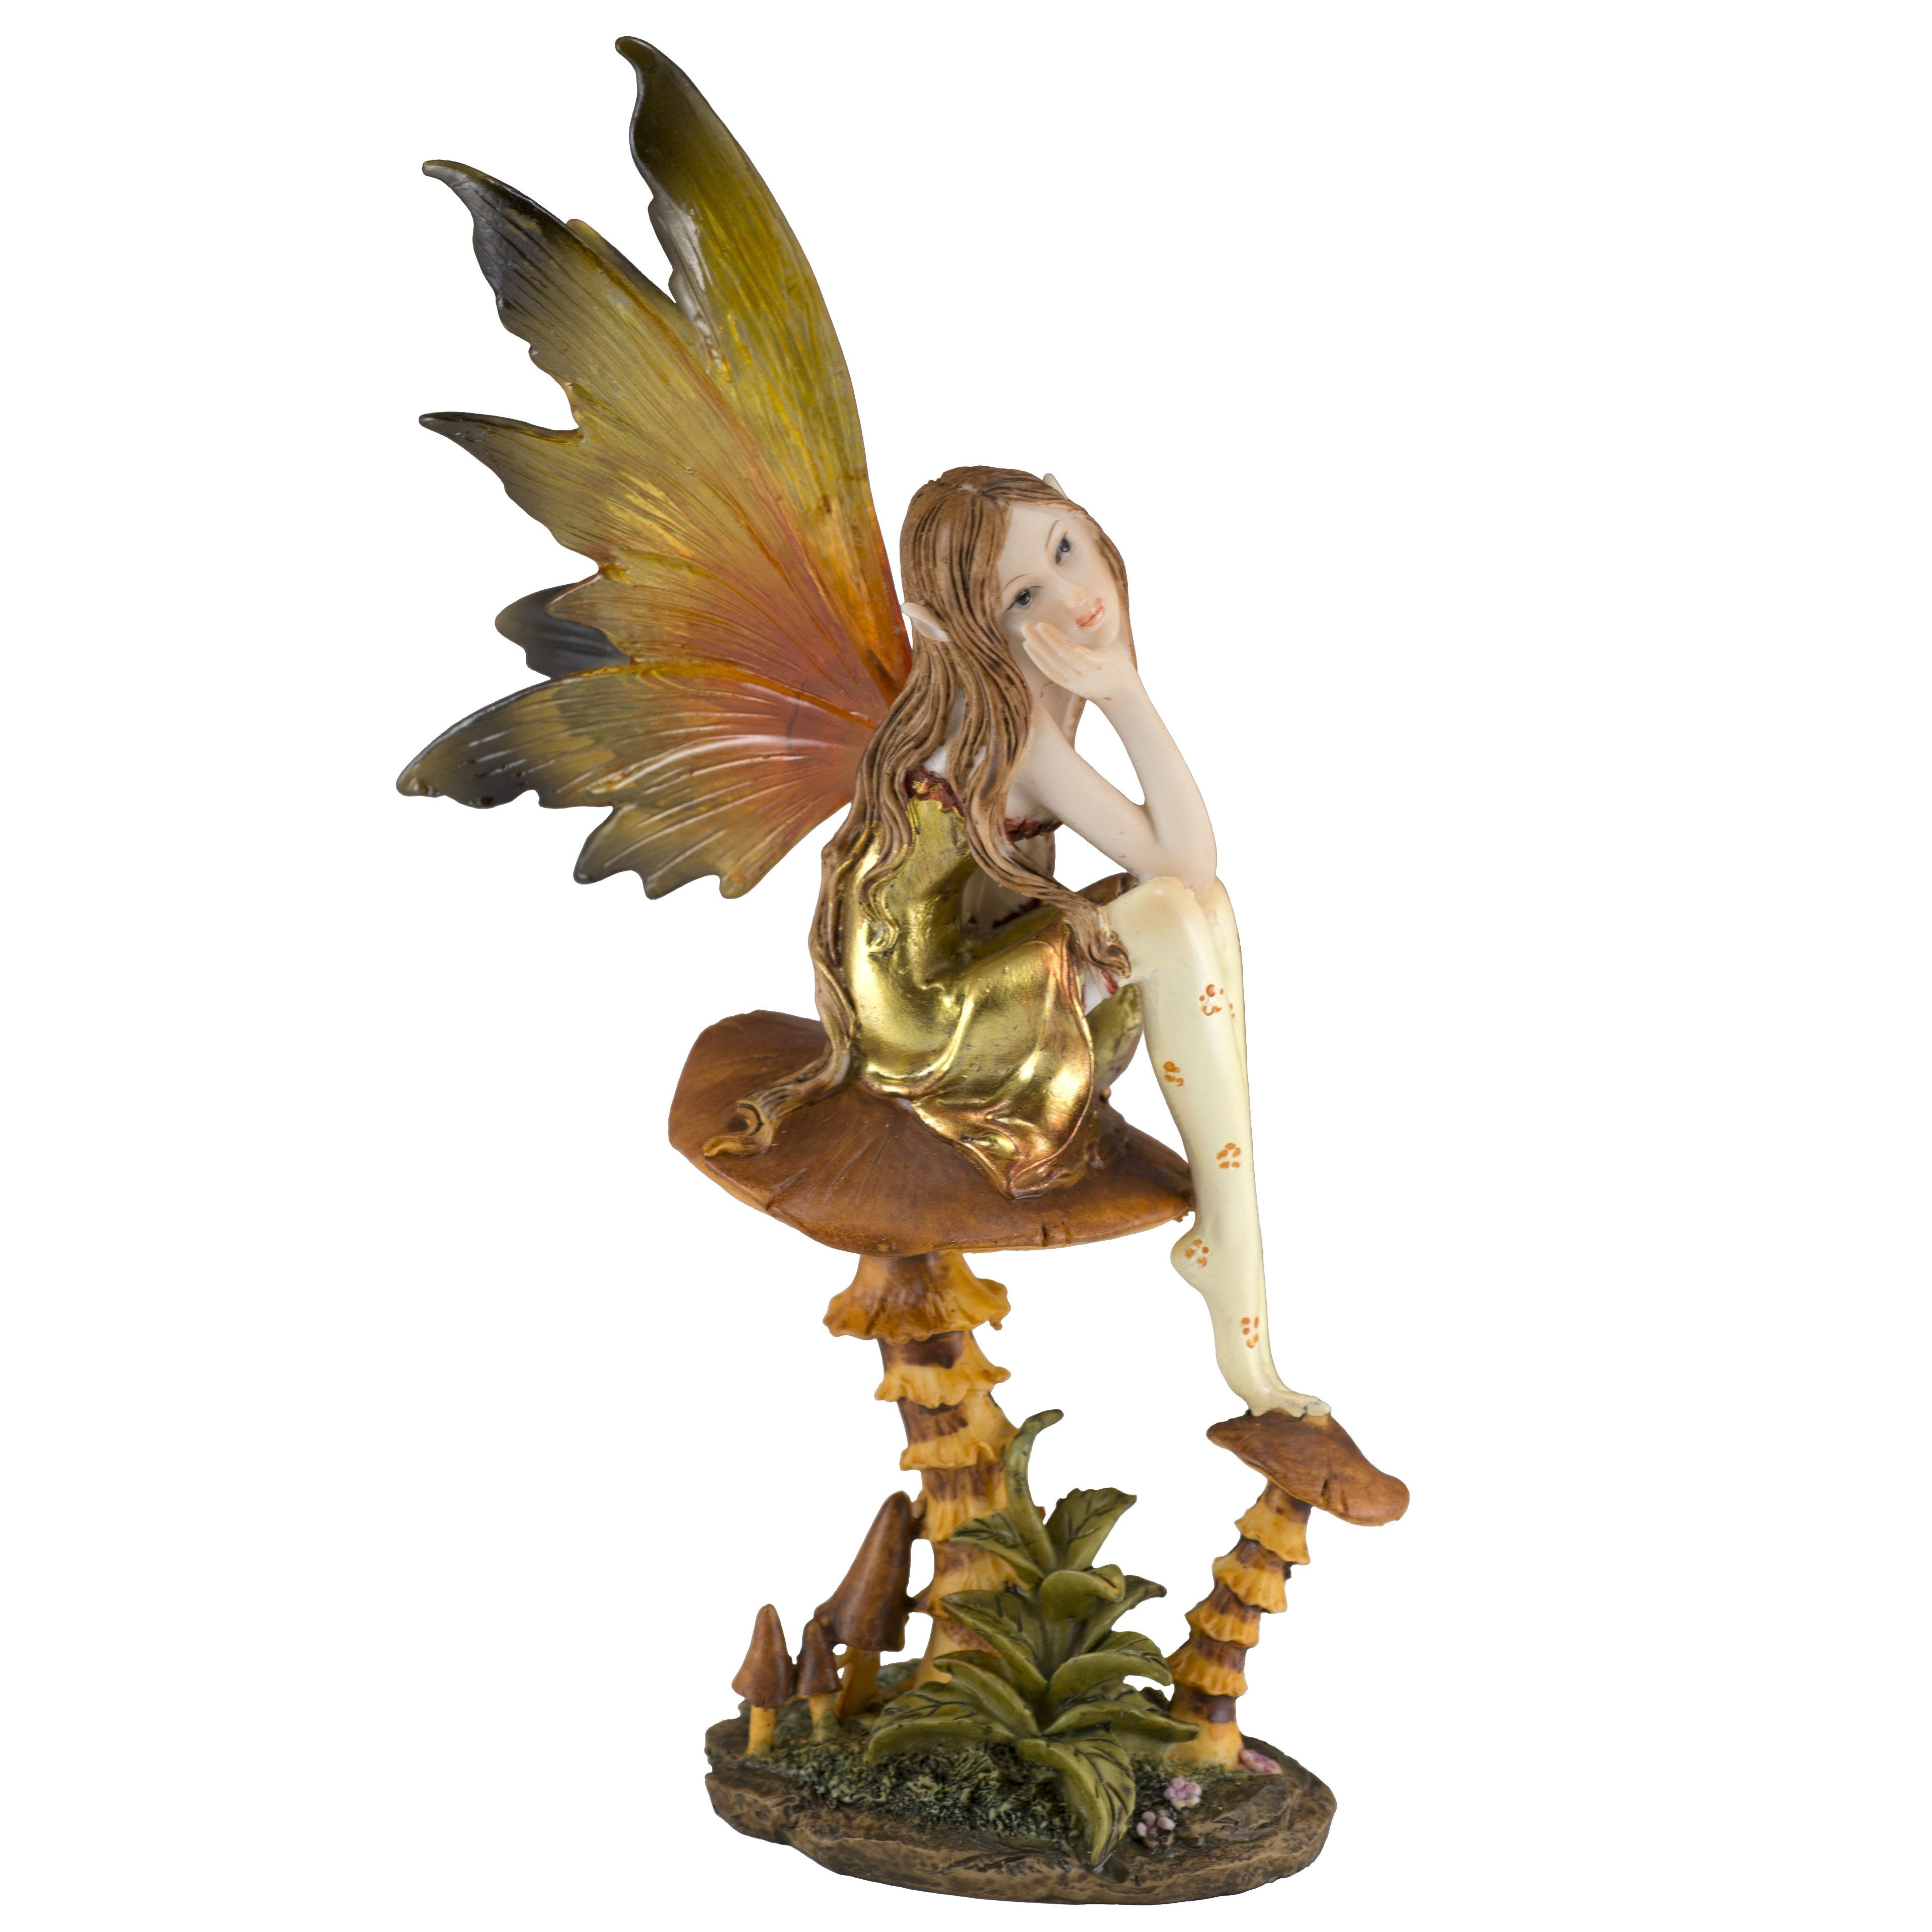 Statues Zeus Statuesdenver Refferal 9243412022 Statues Fairy Statues Mushroom Art Statue